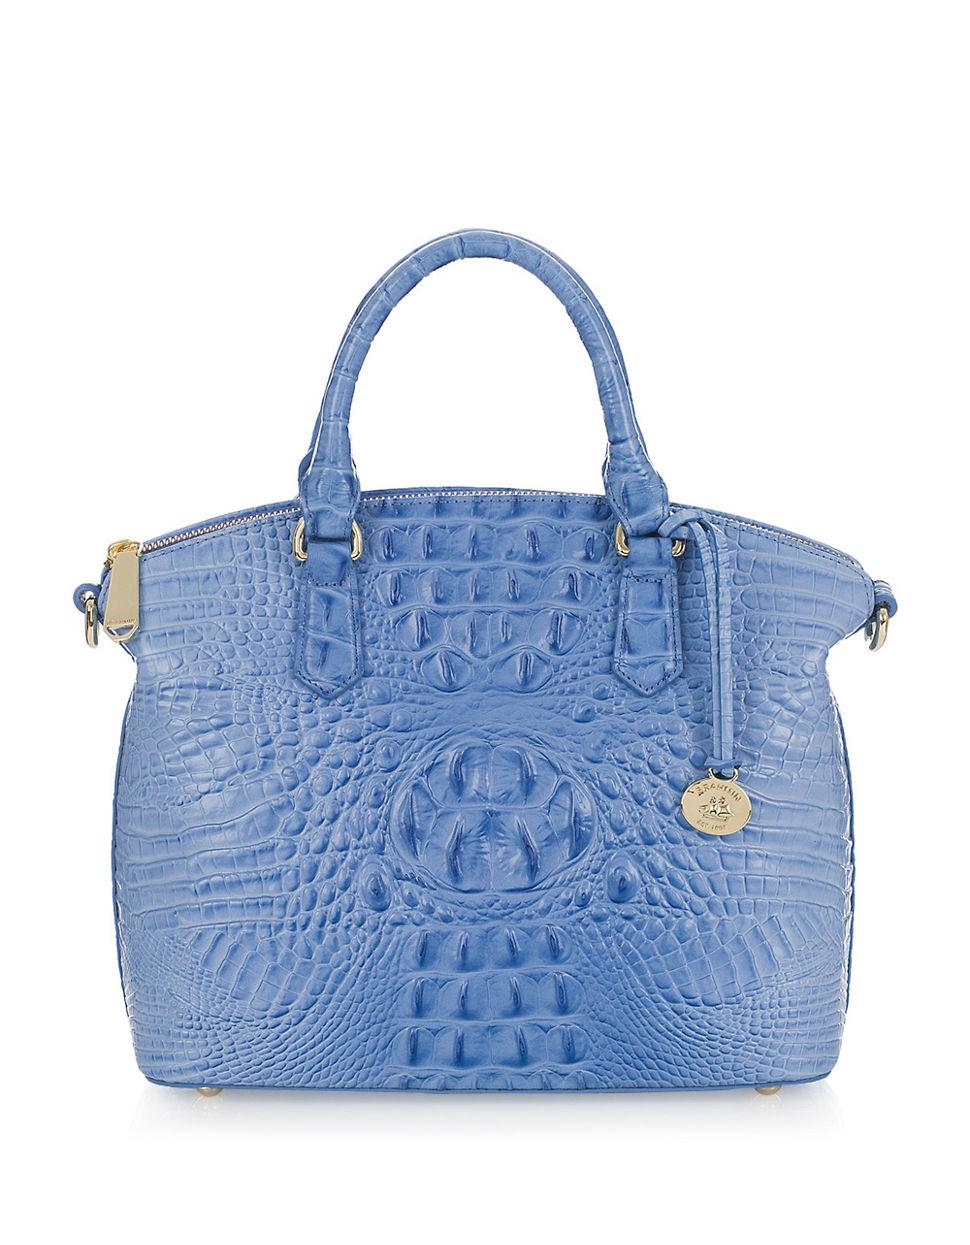 Lyst - Brahmin Duxbury Embossed Leather Satchel in Blue